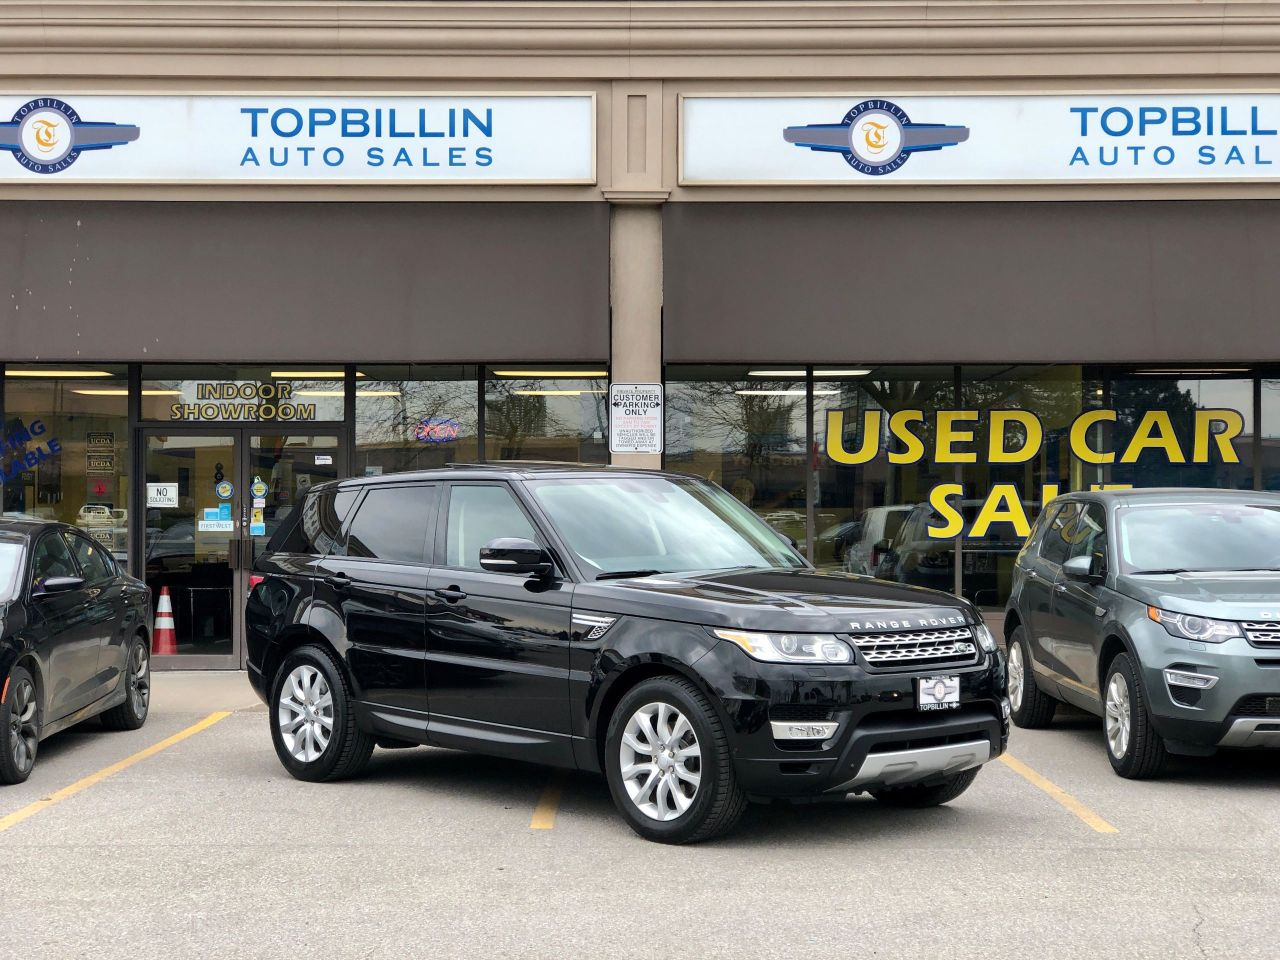 2015 Land Rover Range Rover Sport V6 HSE, Auto Pilot Park, Navi, Blind Spot